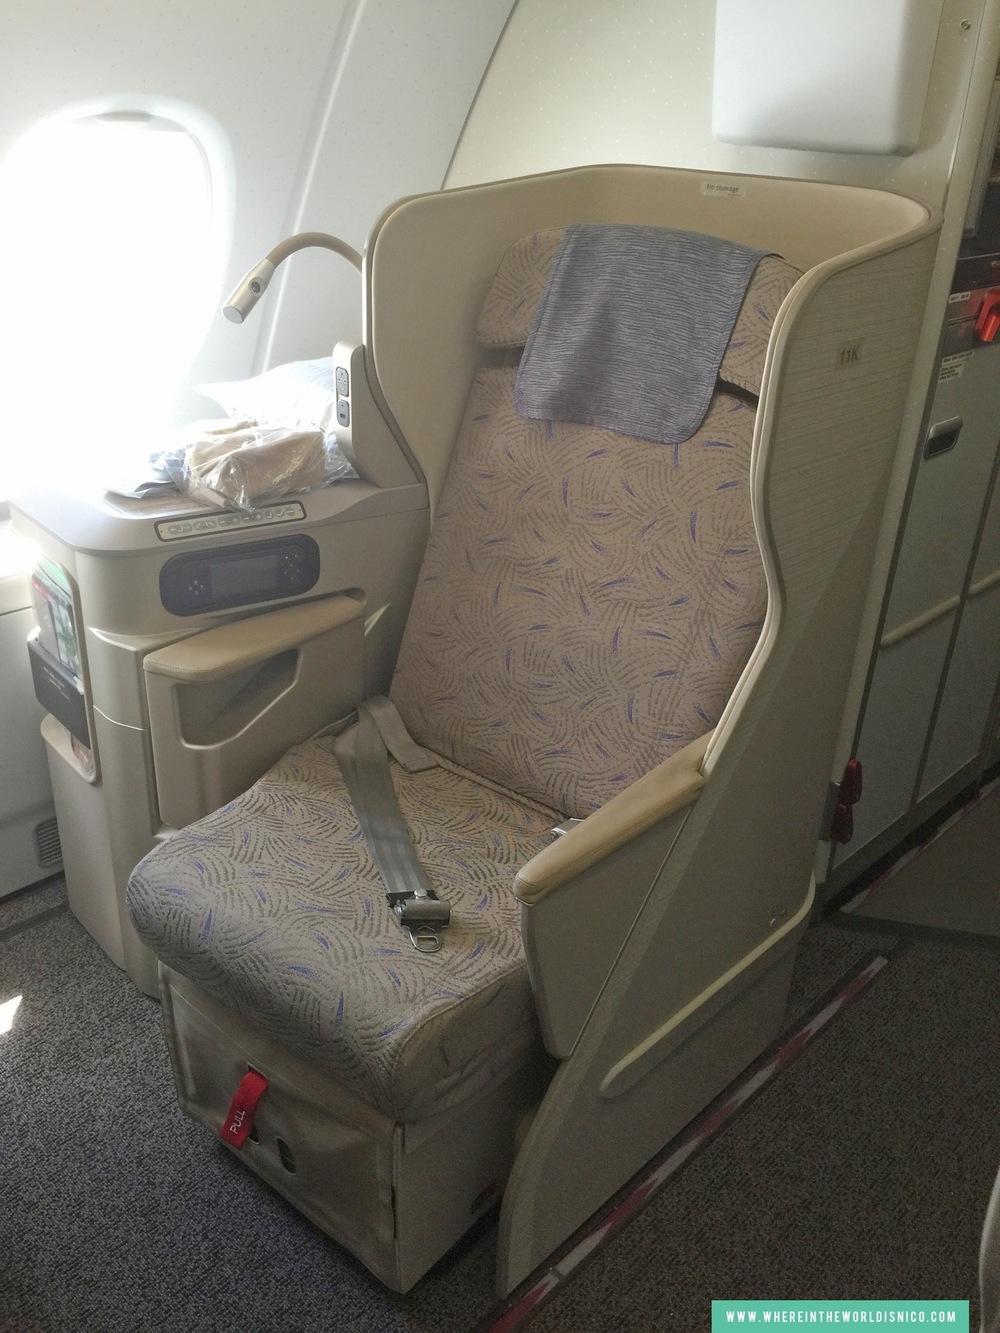 asiana-a380-icn-lax-seat-11k.JPG